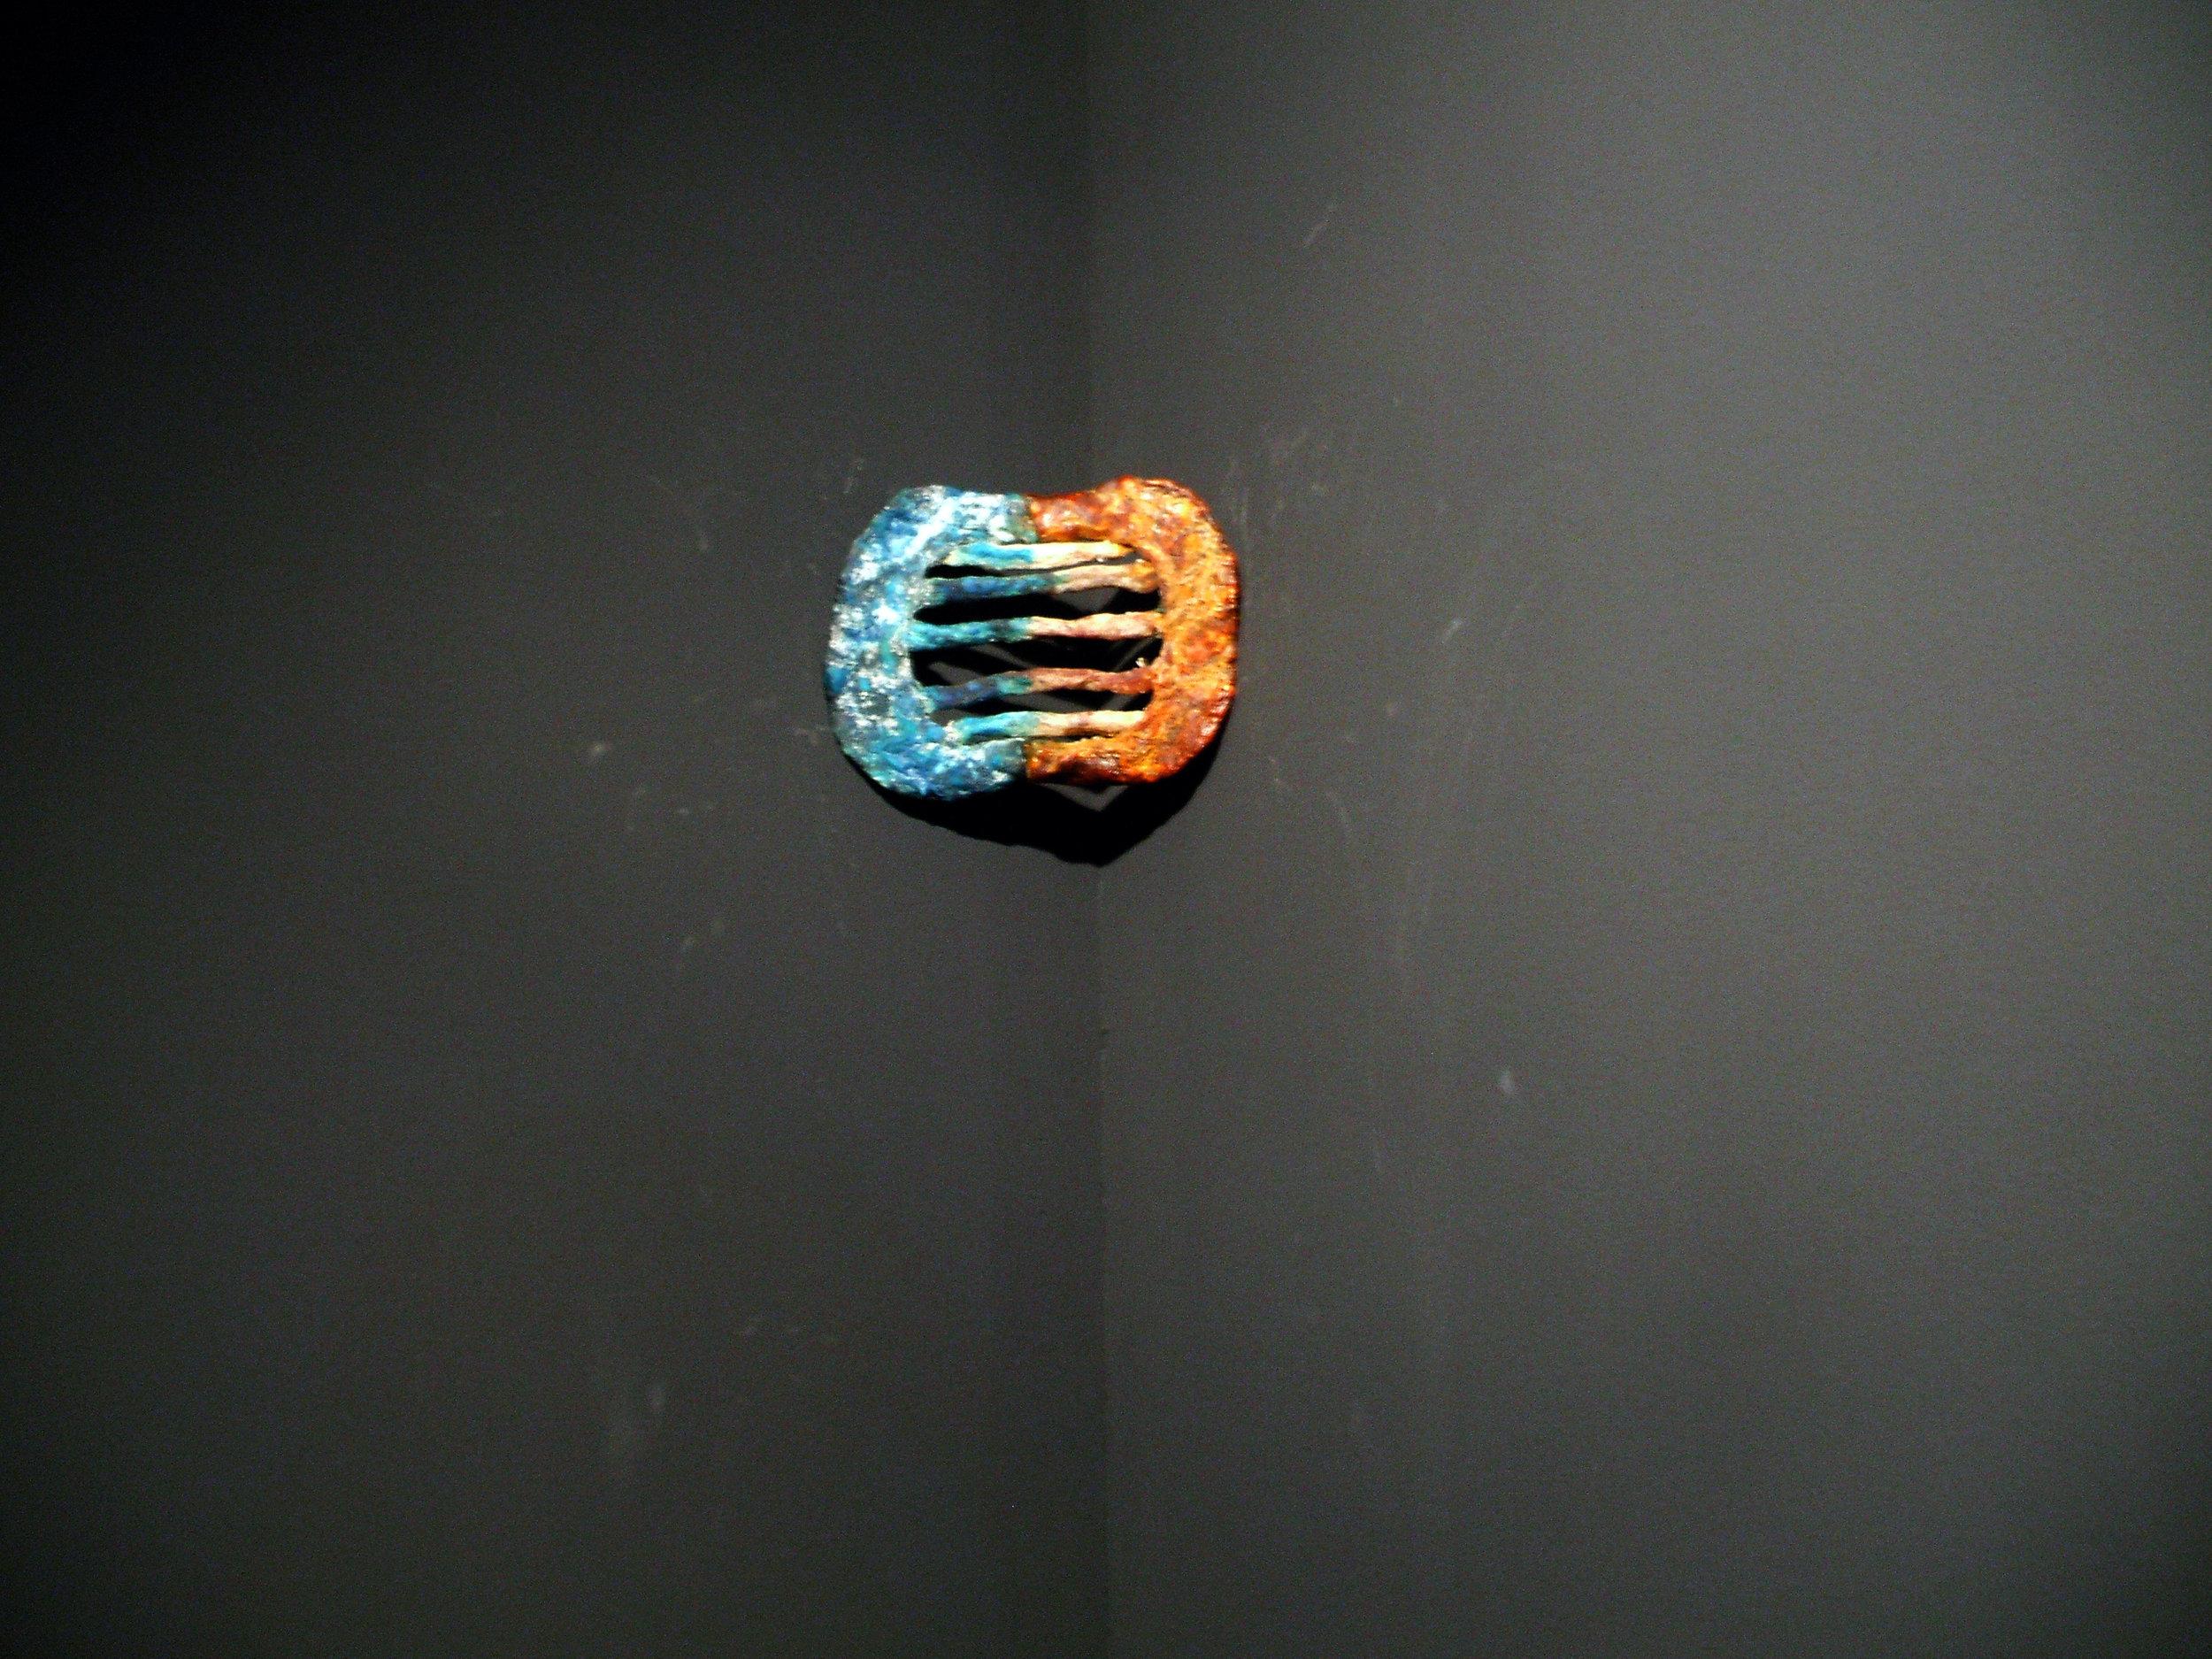 """Semanario sanguíneo"". Serie de iconos. Carne, tripa de cerdo, colorante alimenticio, hilo. 20 x 15 x 1,5 cm. 2011"